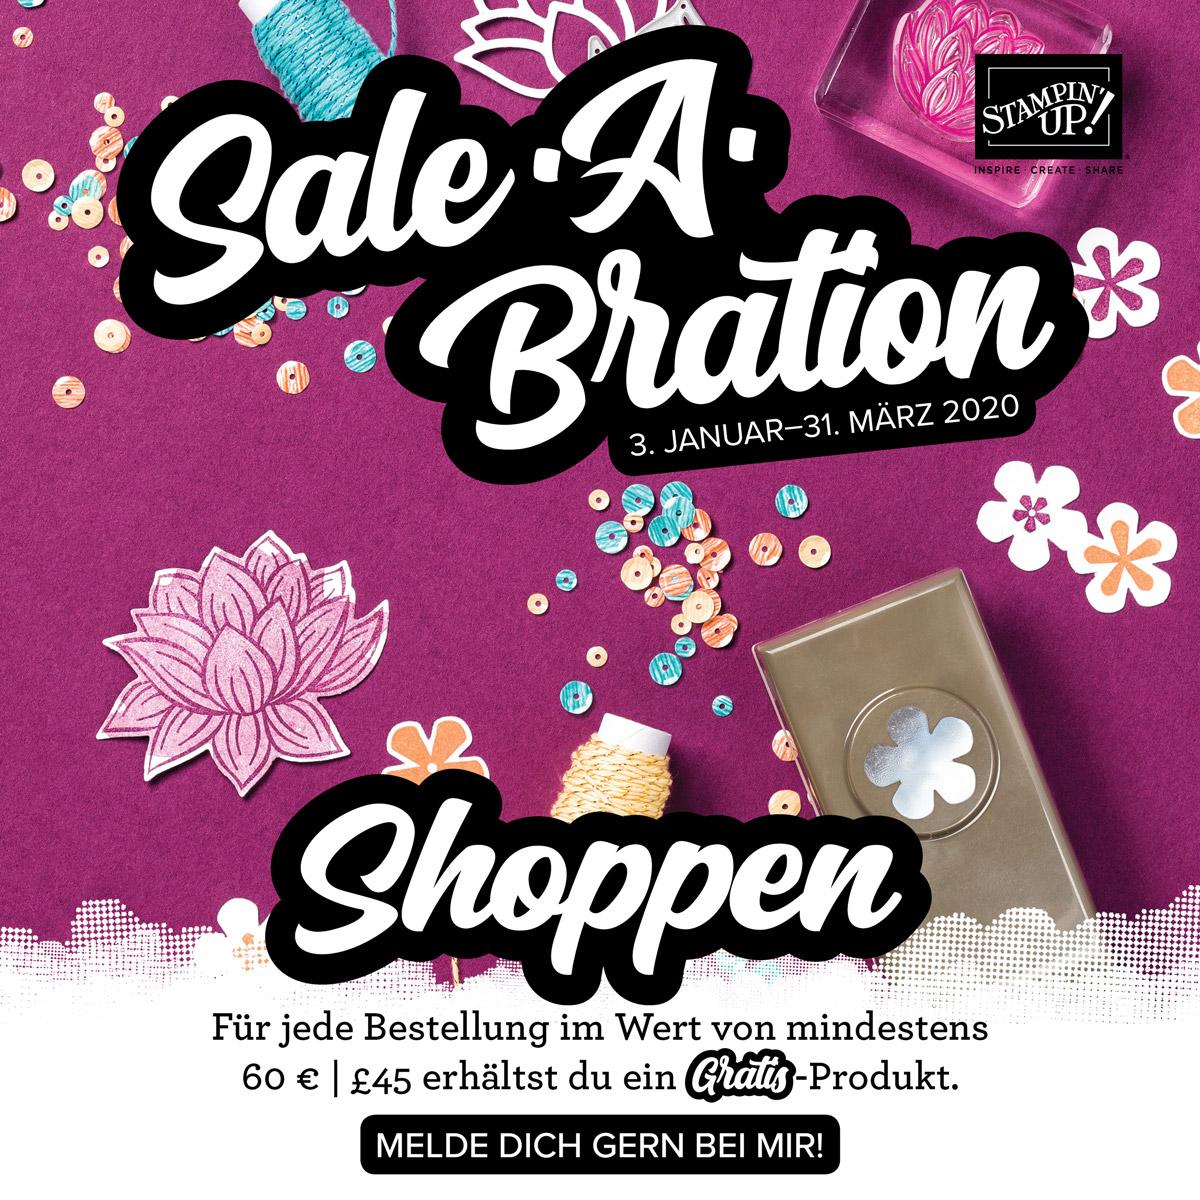 Stampin Up-Sale-a-bration